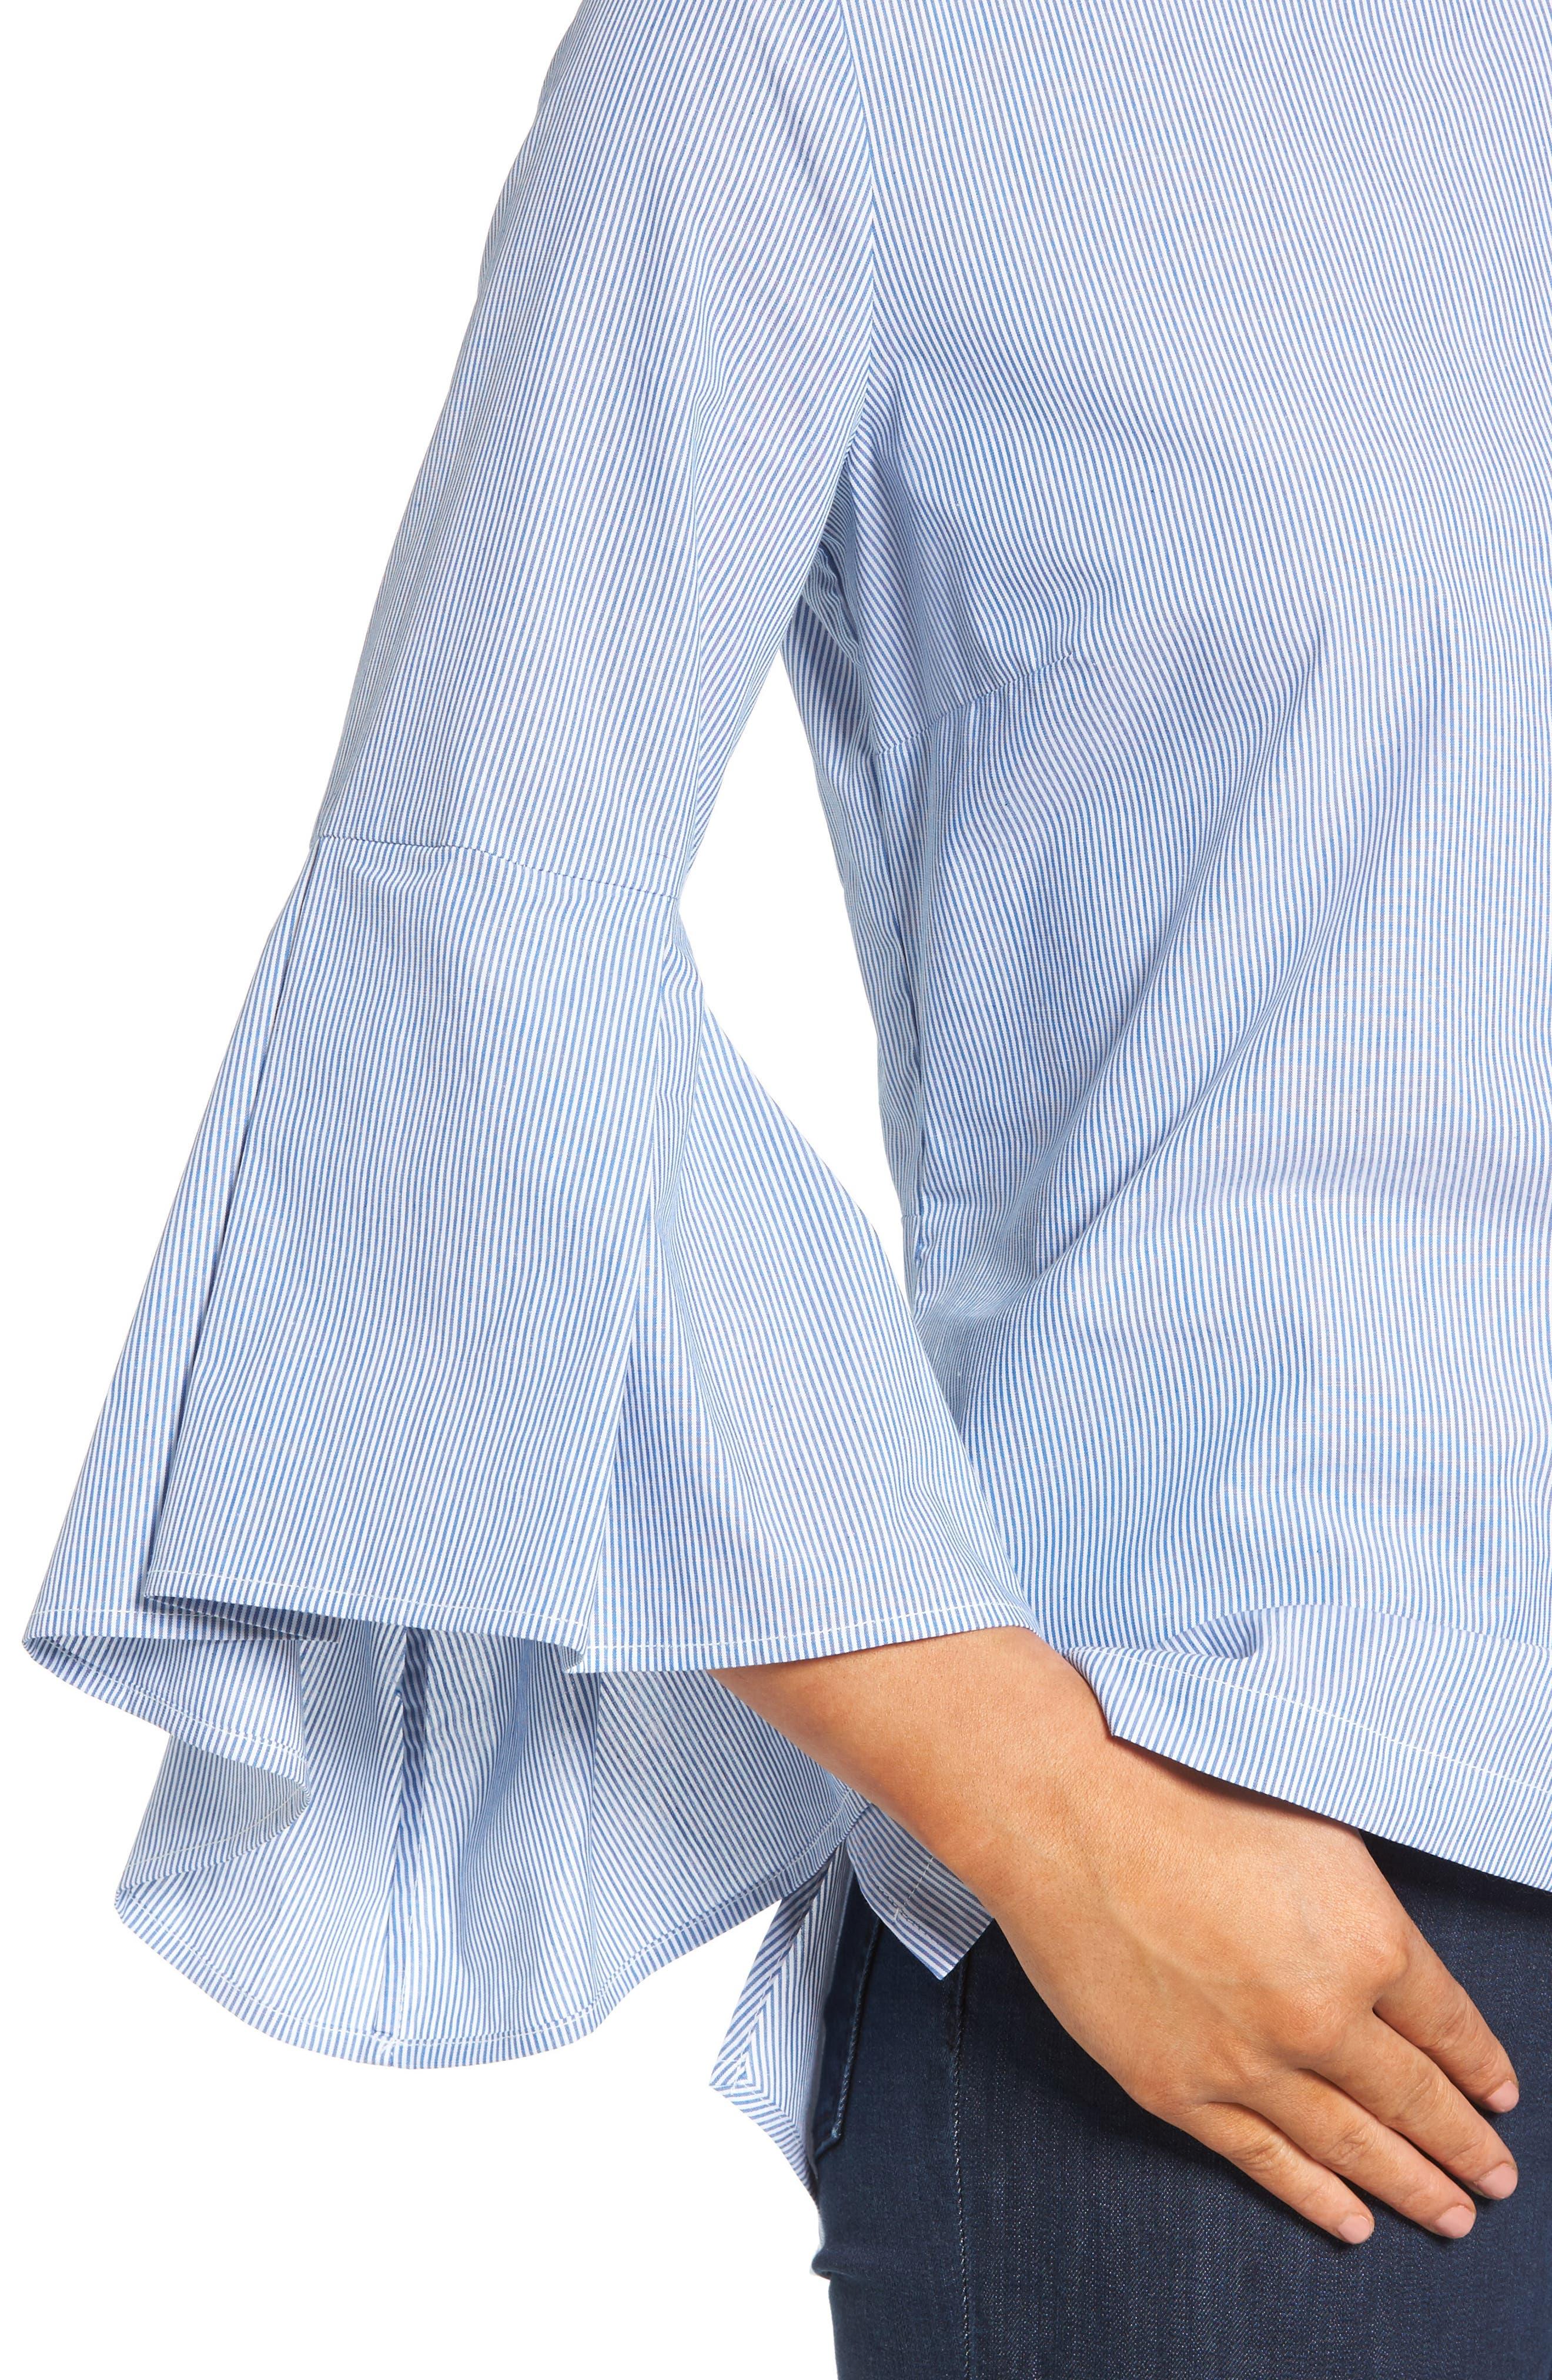 Ruffle Sleeve Poplin Shirt,                             Alternate thumbnail 5, color,                             Blue/ White Stripe